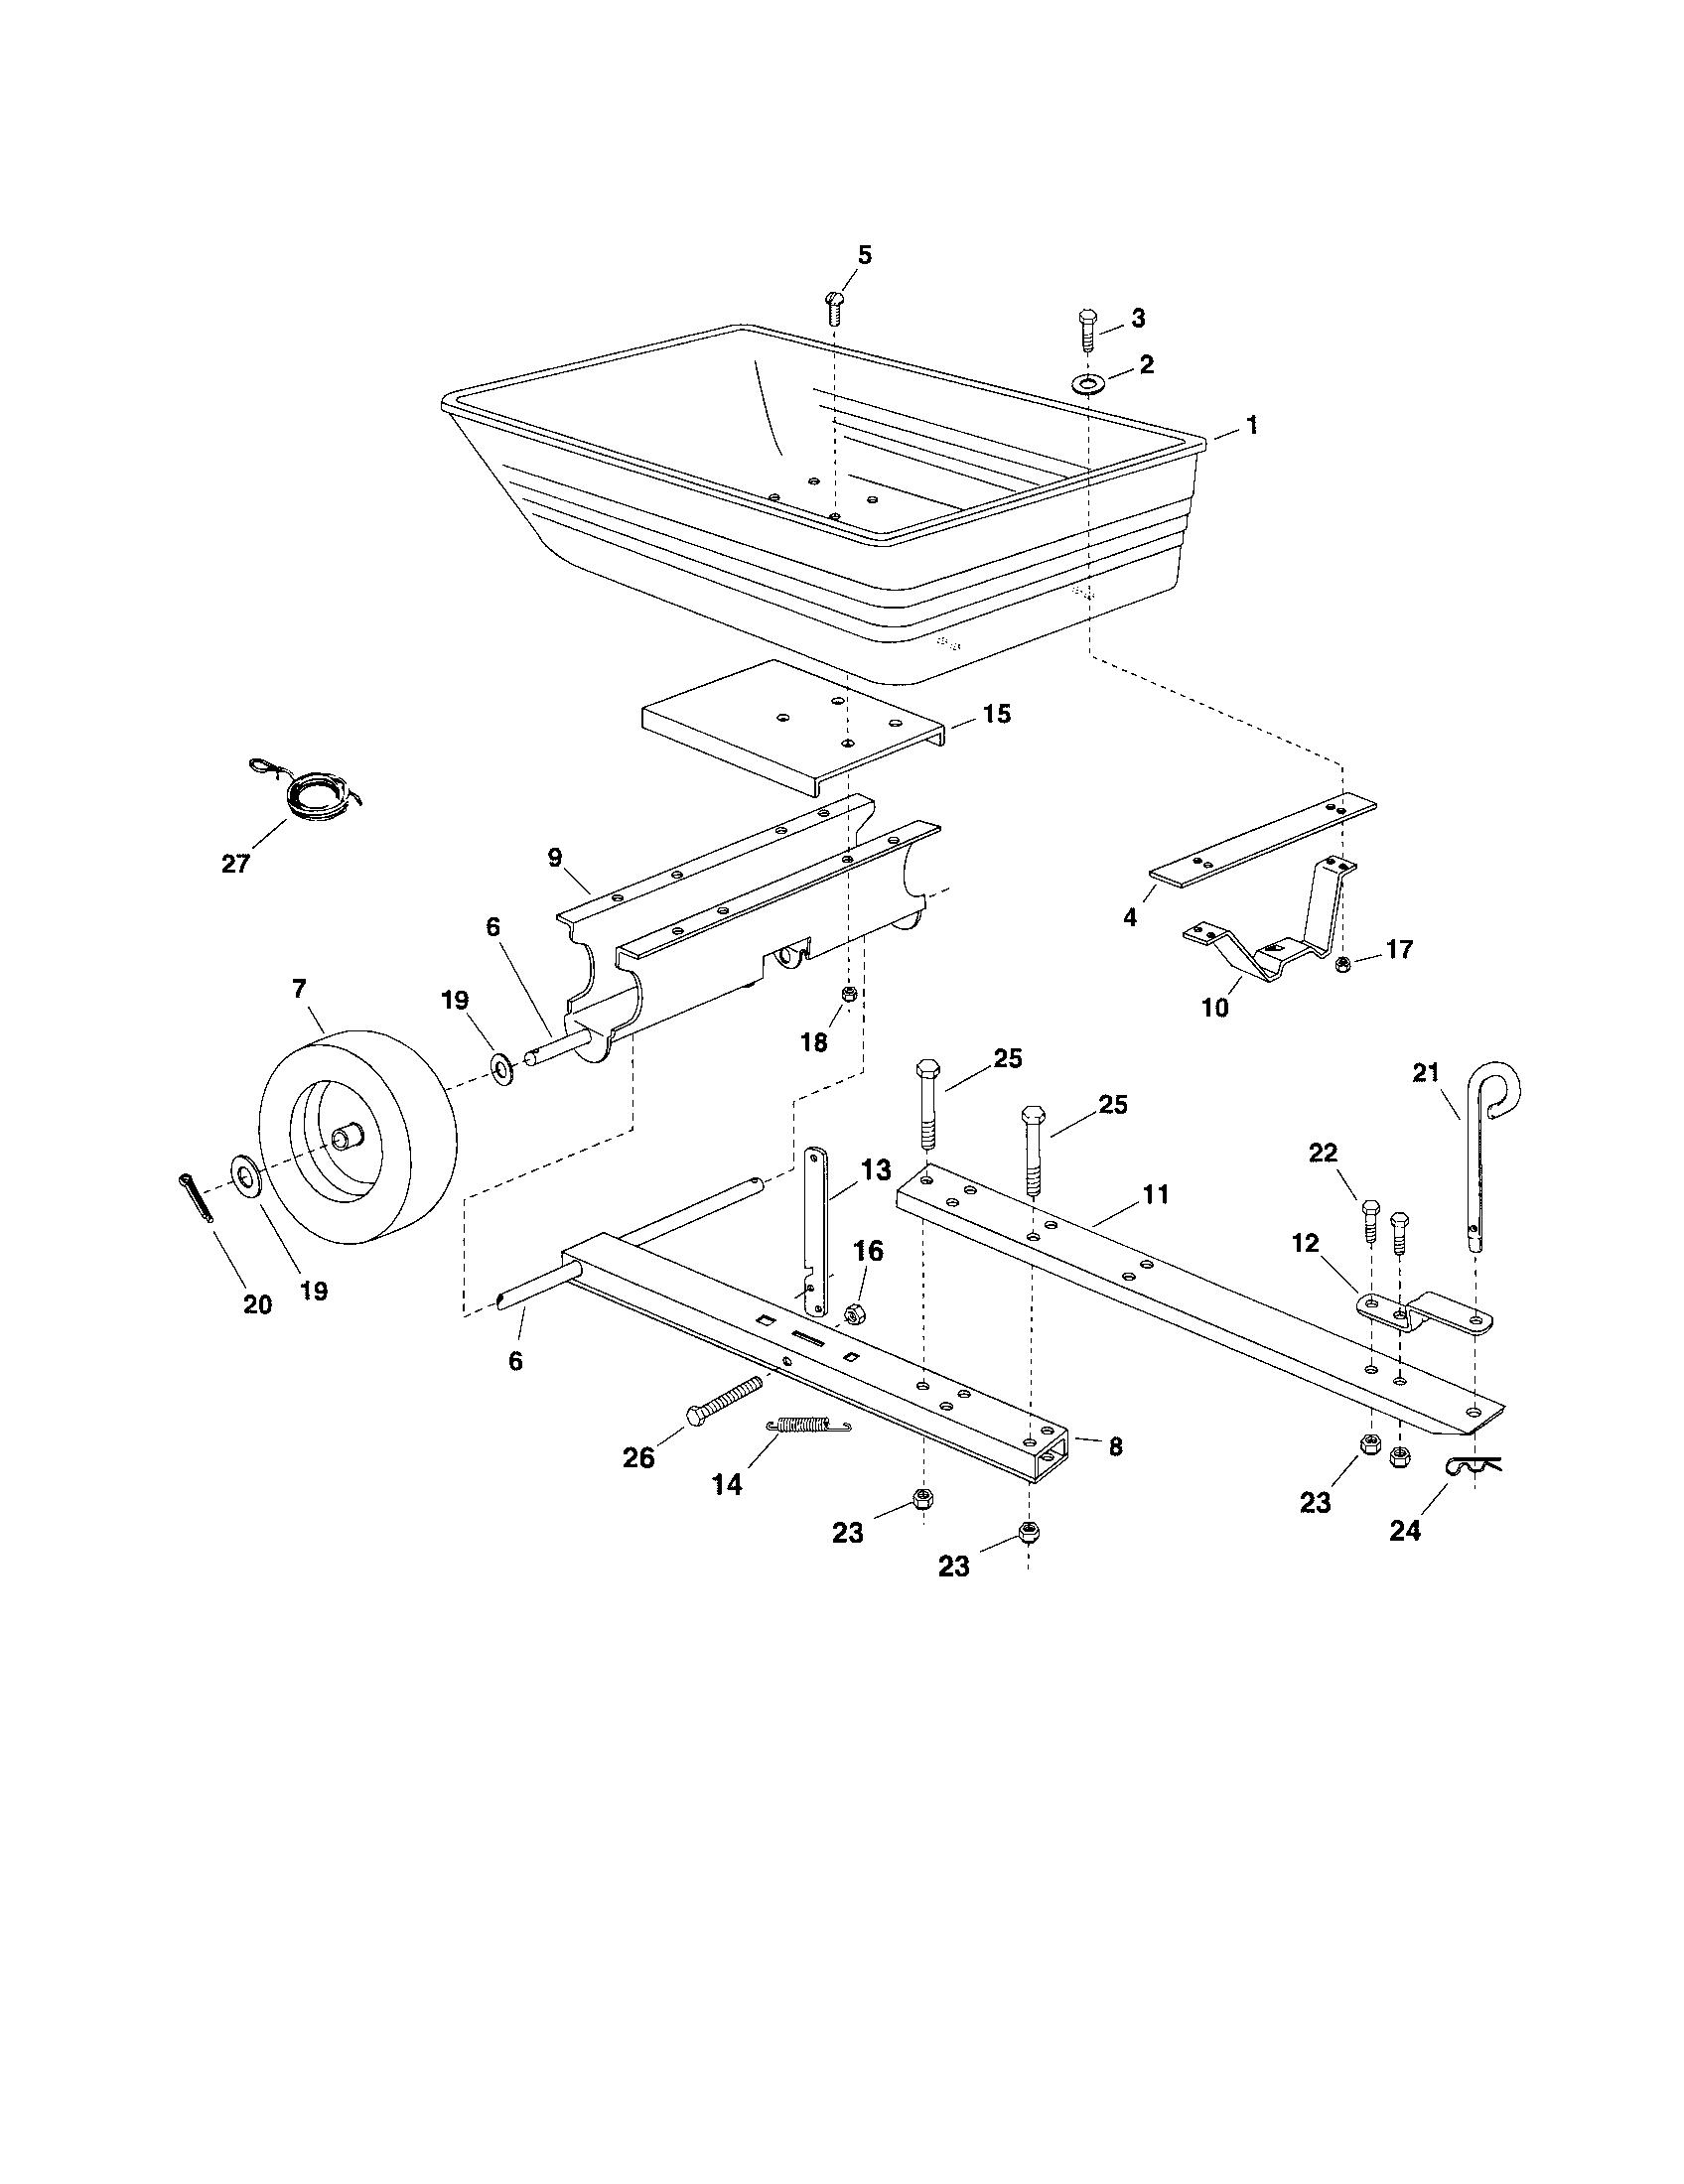 Craftsman model 48624507 lawn vacuum genuine parts